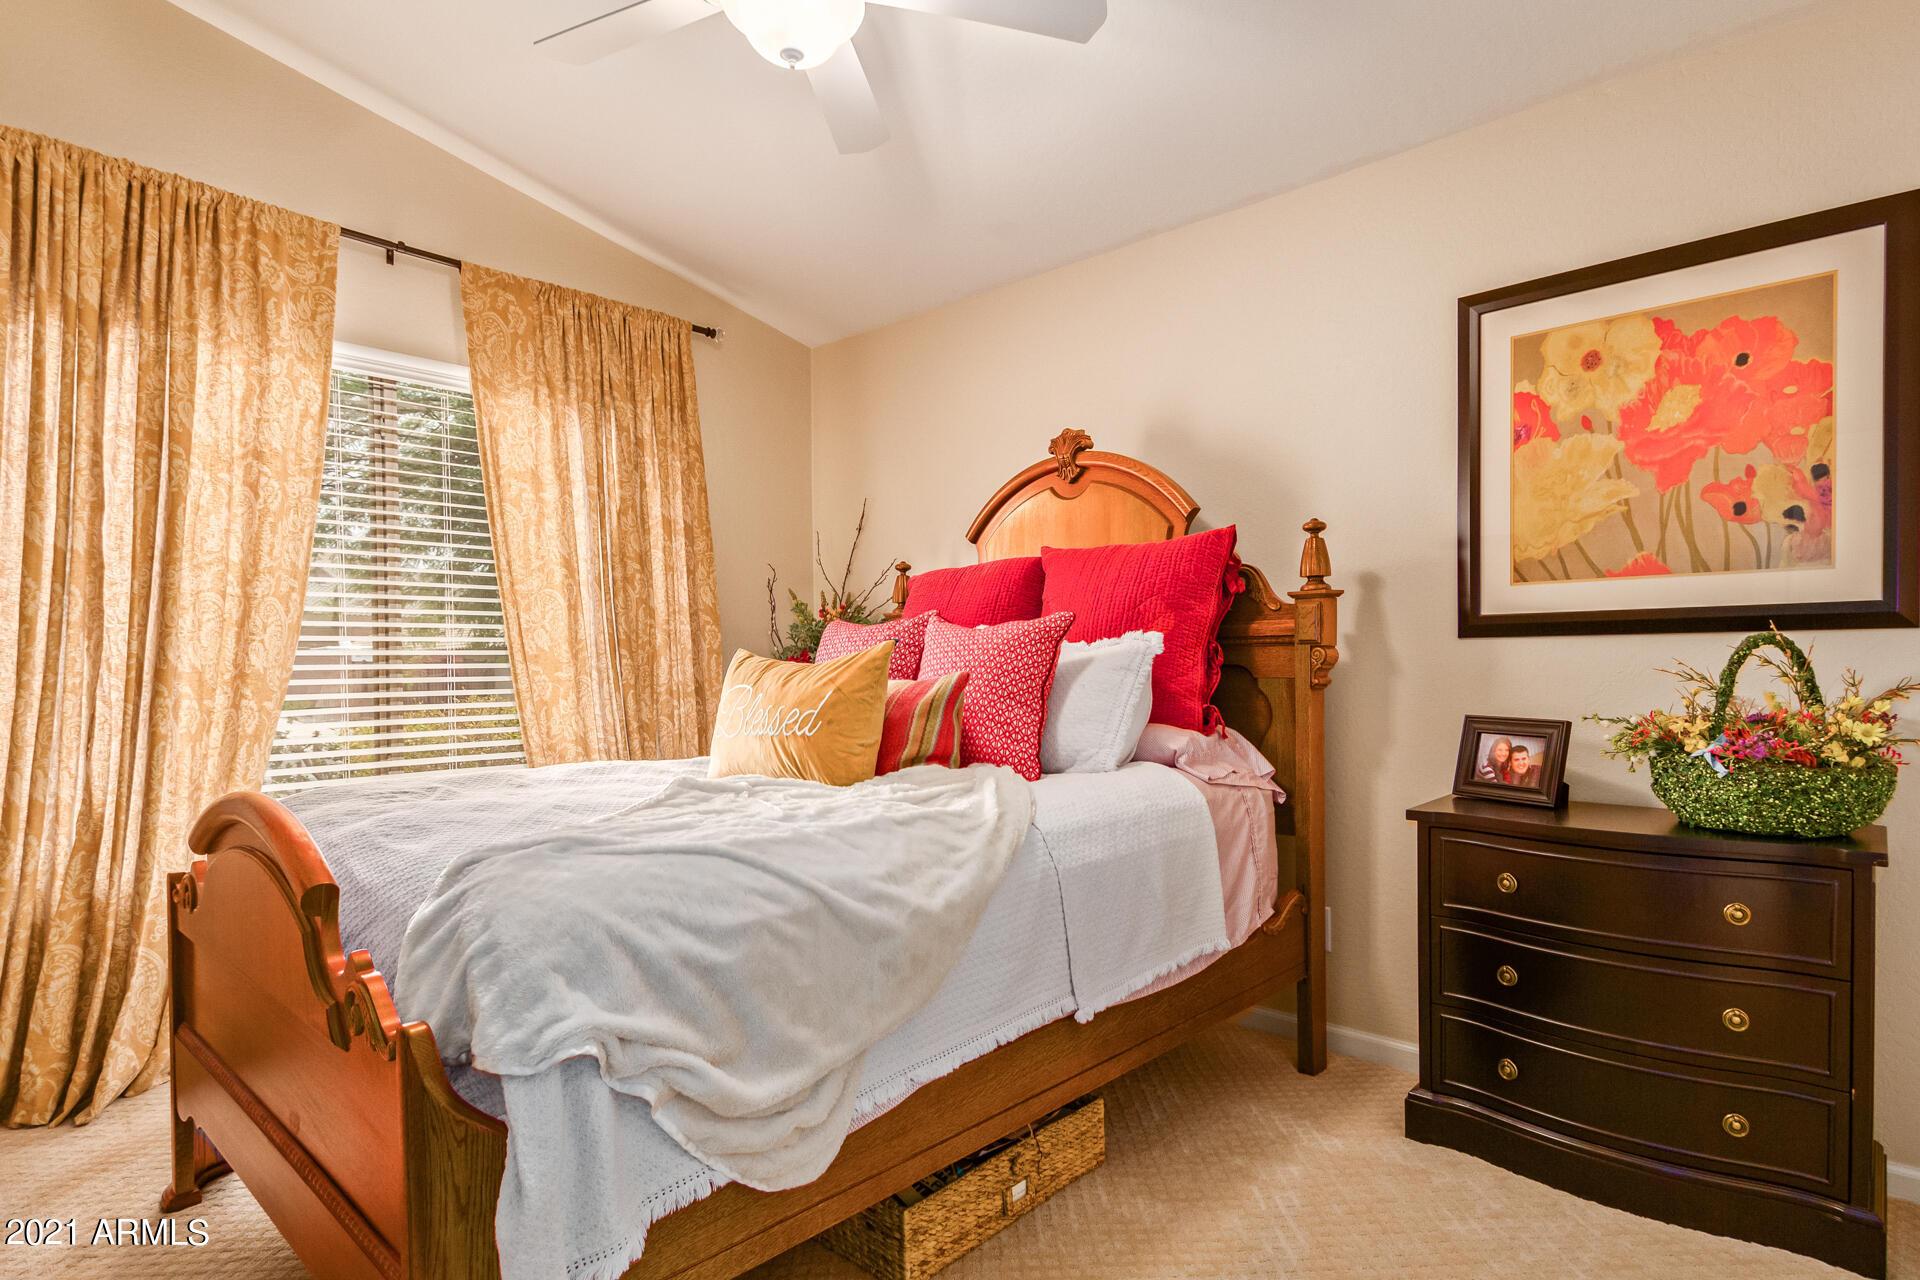 2026 DUANE Lane, Phoenix, Arizona 85085, 4 Bedrooms Bedrooms, ,3 BathroomsBathrooms,Residential,For Sale,DUANE,6265399